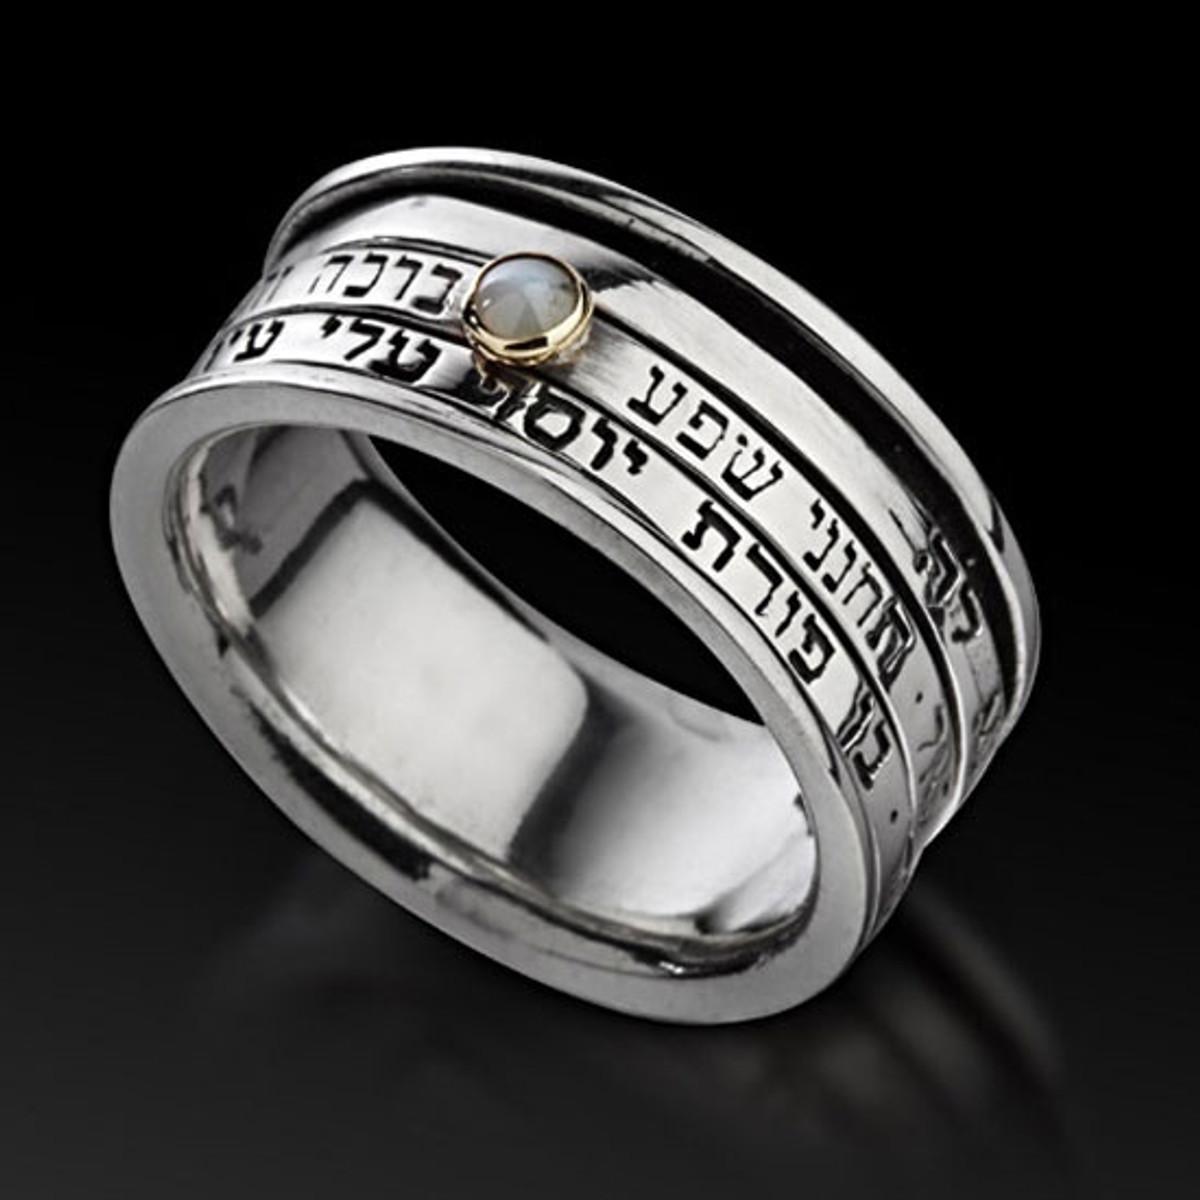 Prosperity Silver Tarshish Ring With Inserted Chrysoberyl